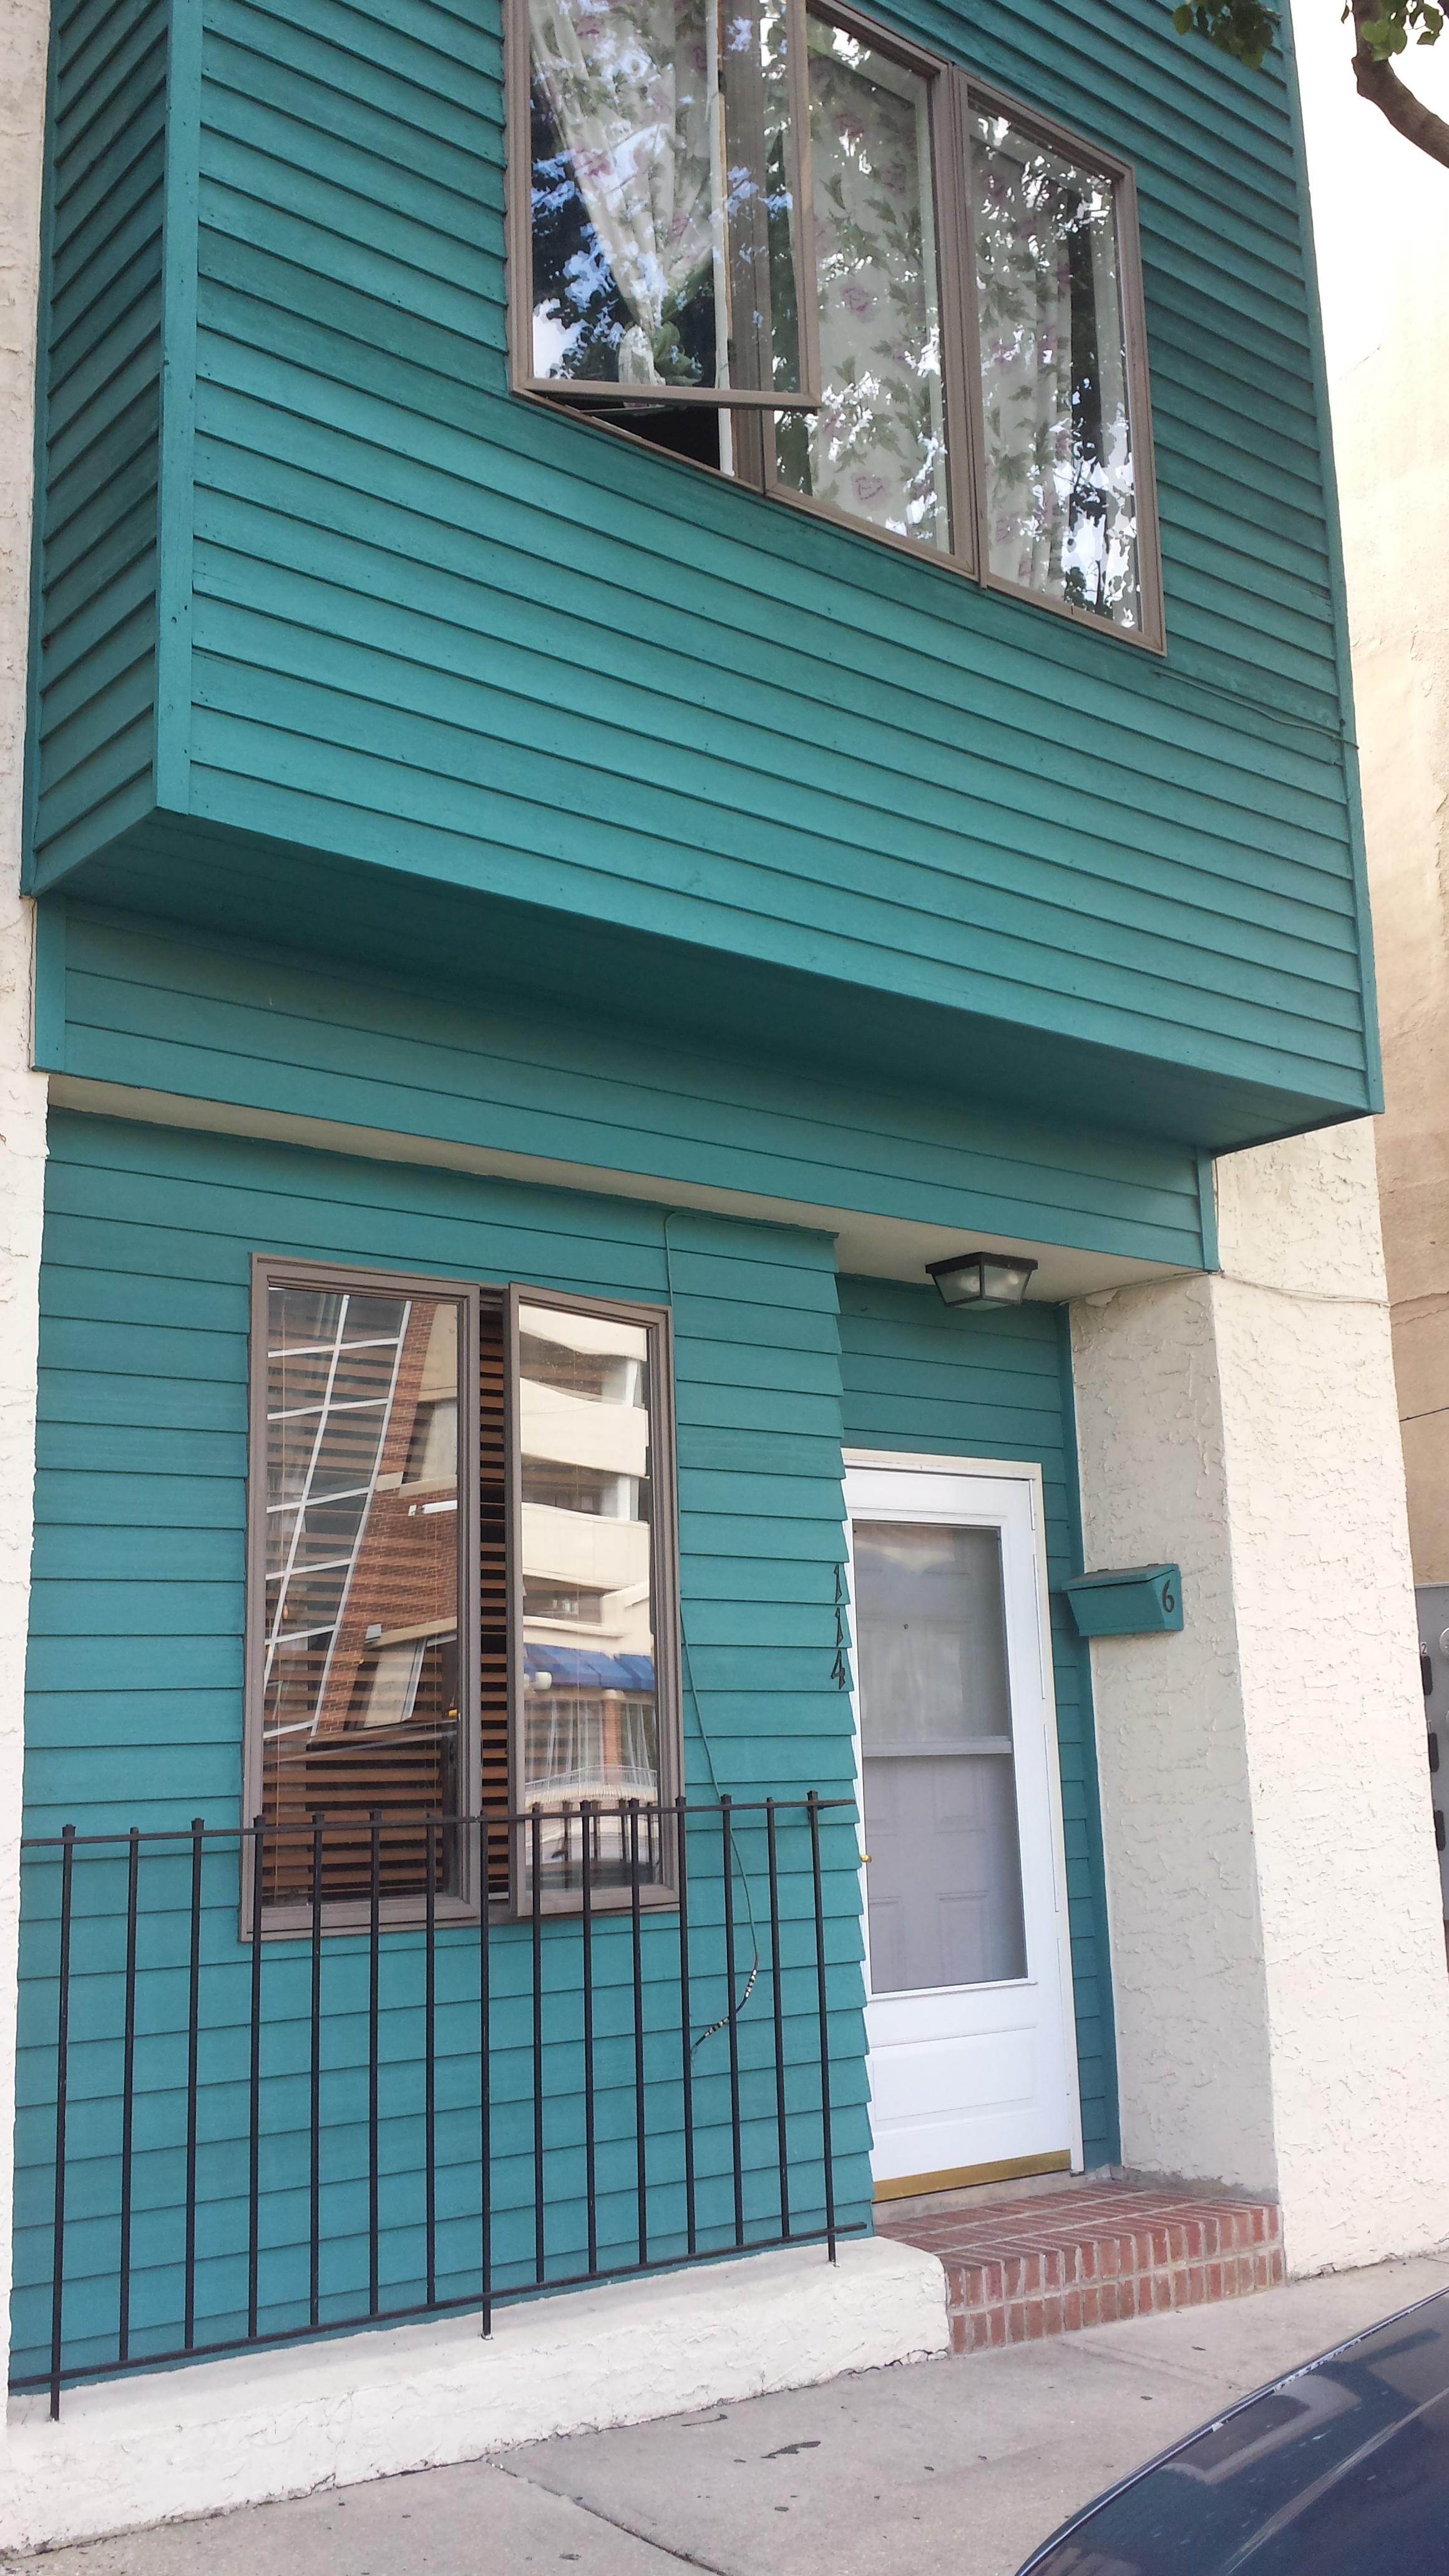 114 North Mississippi Avenue 1 Atlantic City NJ 08401 1 Bedroom Apartment